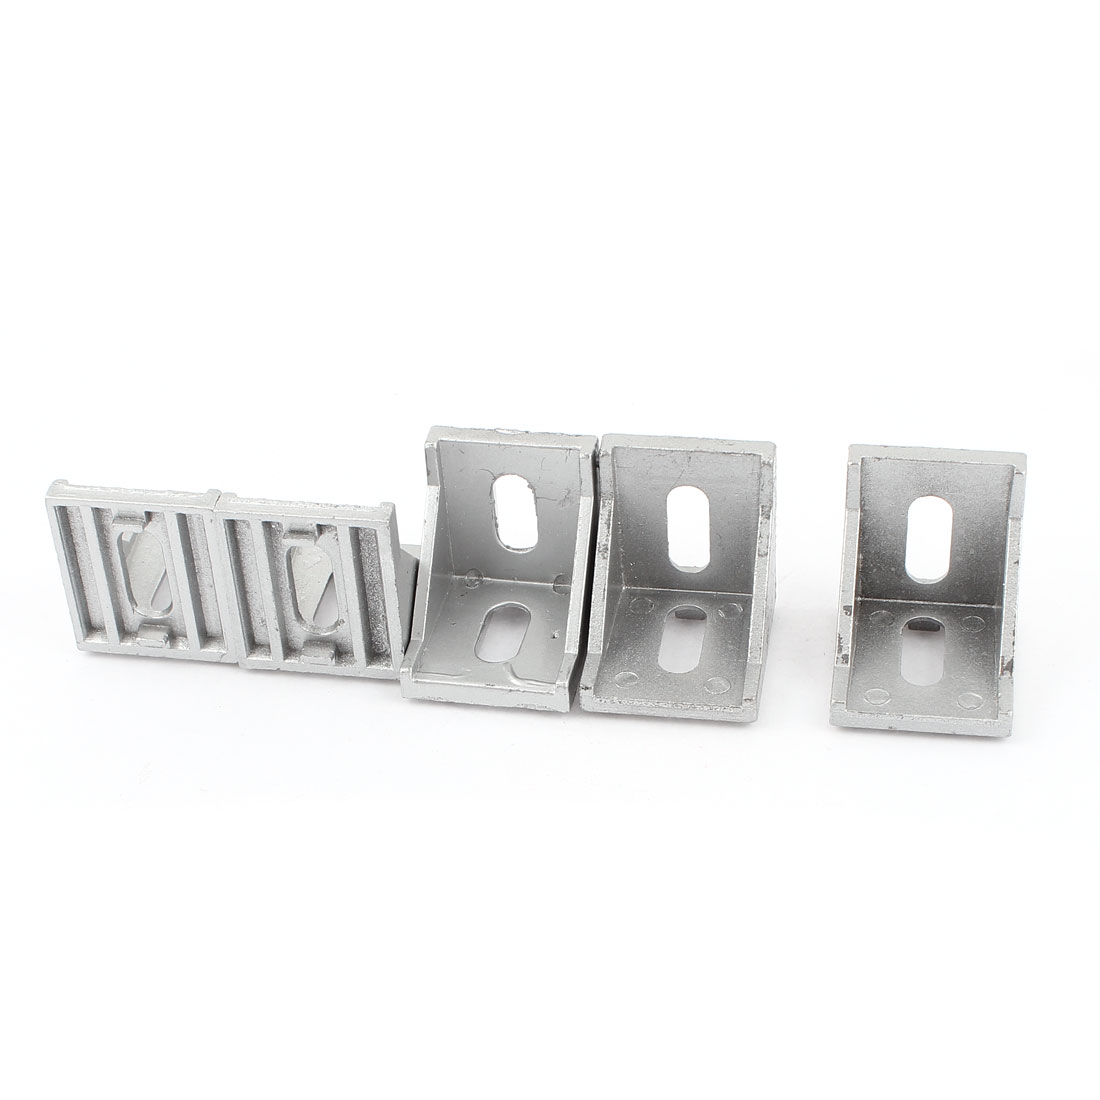 5 Pcs Silver Tone Metal 90 Degree Door Angle Bracket 40mm x 40mm